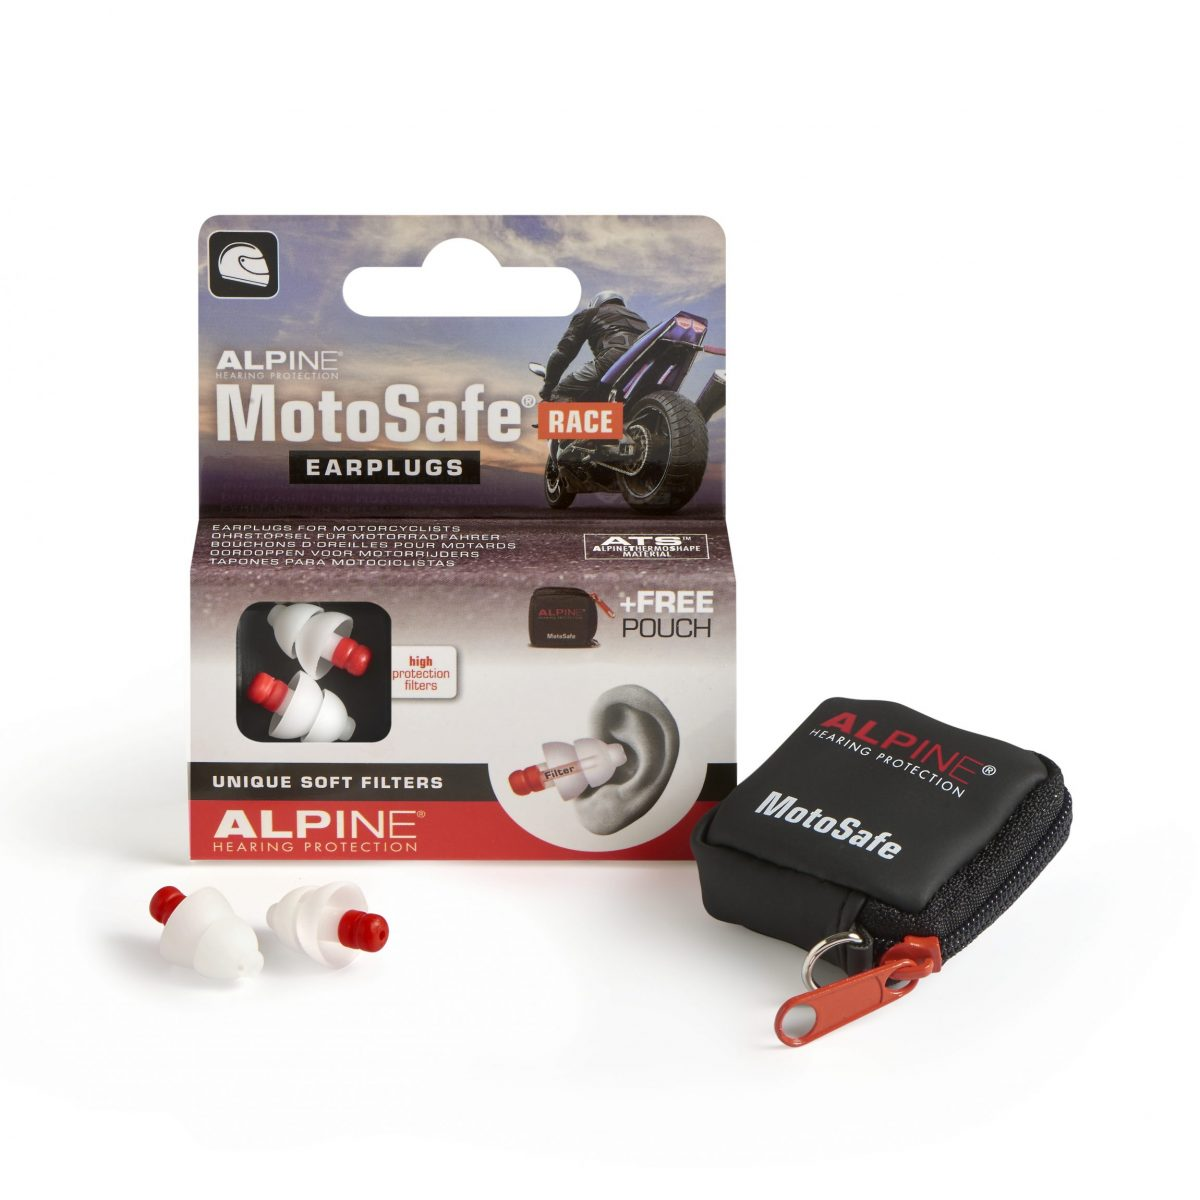 MotoSafe Race